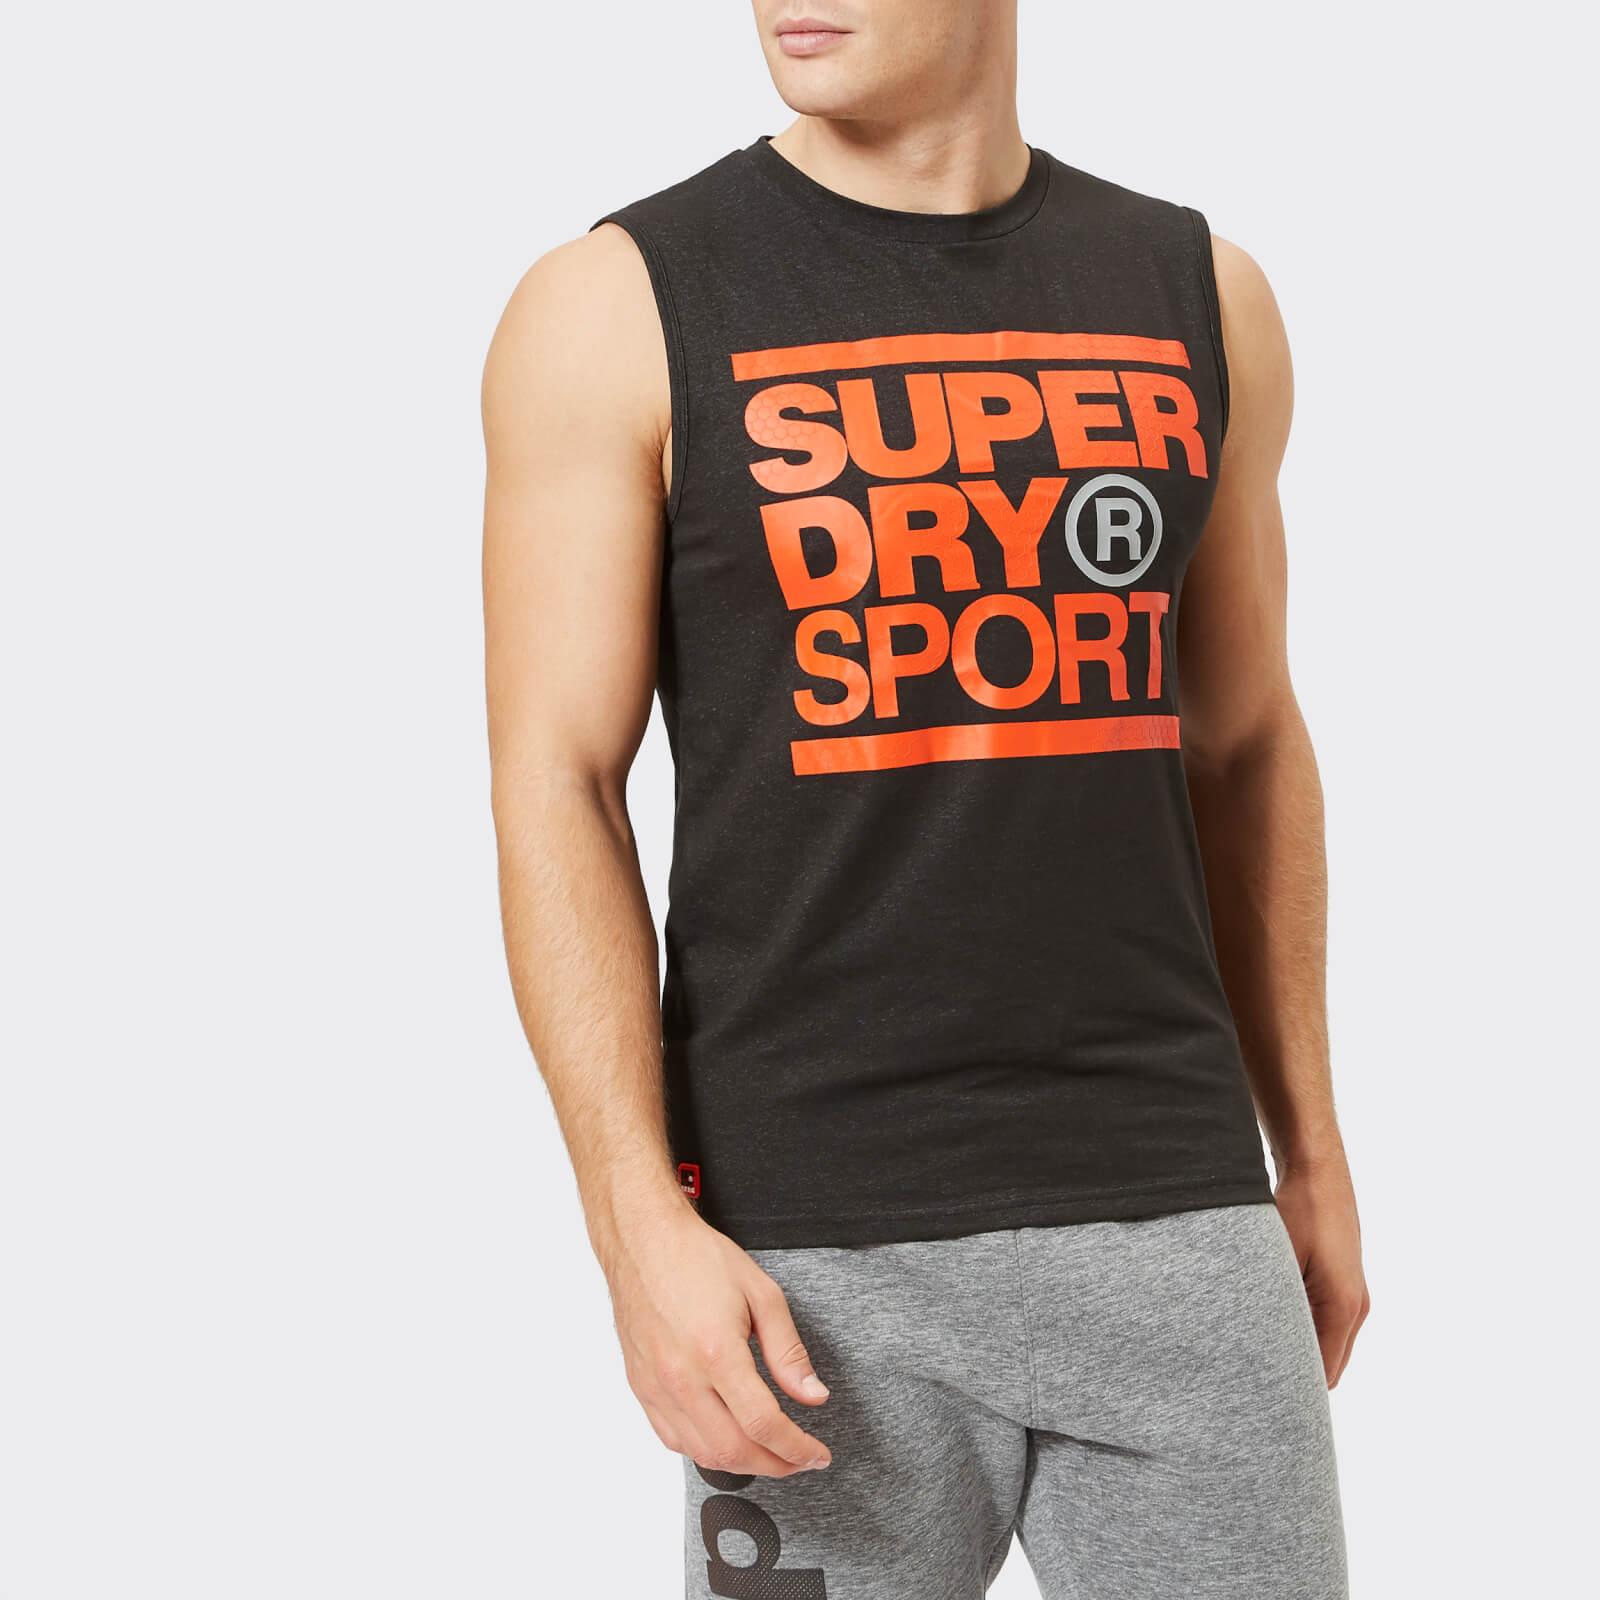 318130c8fa6764 Superdry Sport Men s Core Graphic Tank Top - Black Mens Clothing ...